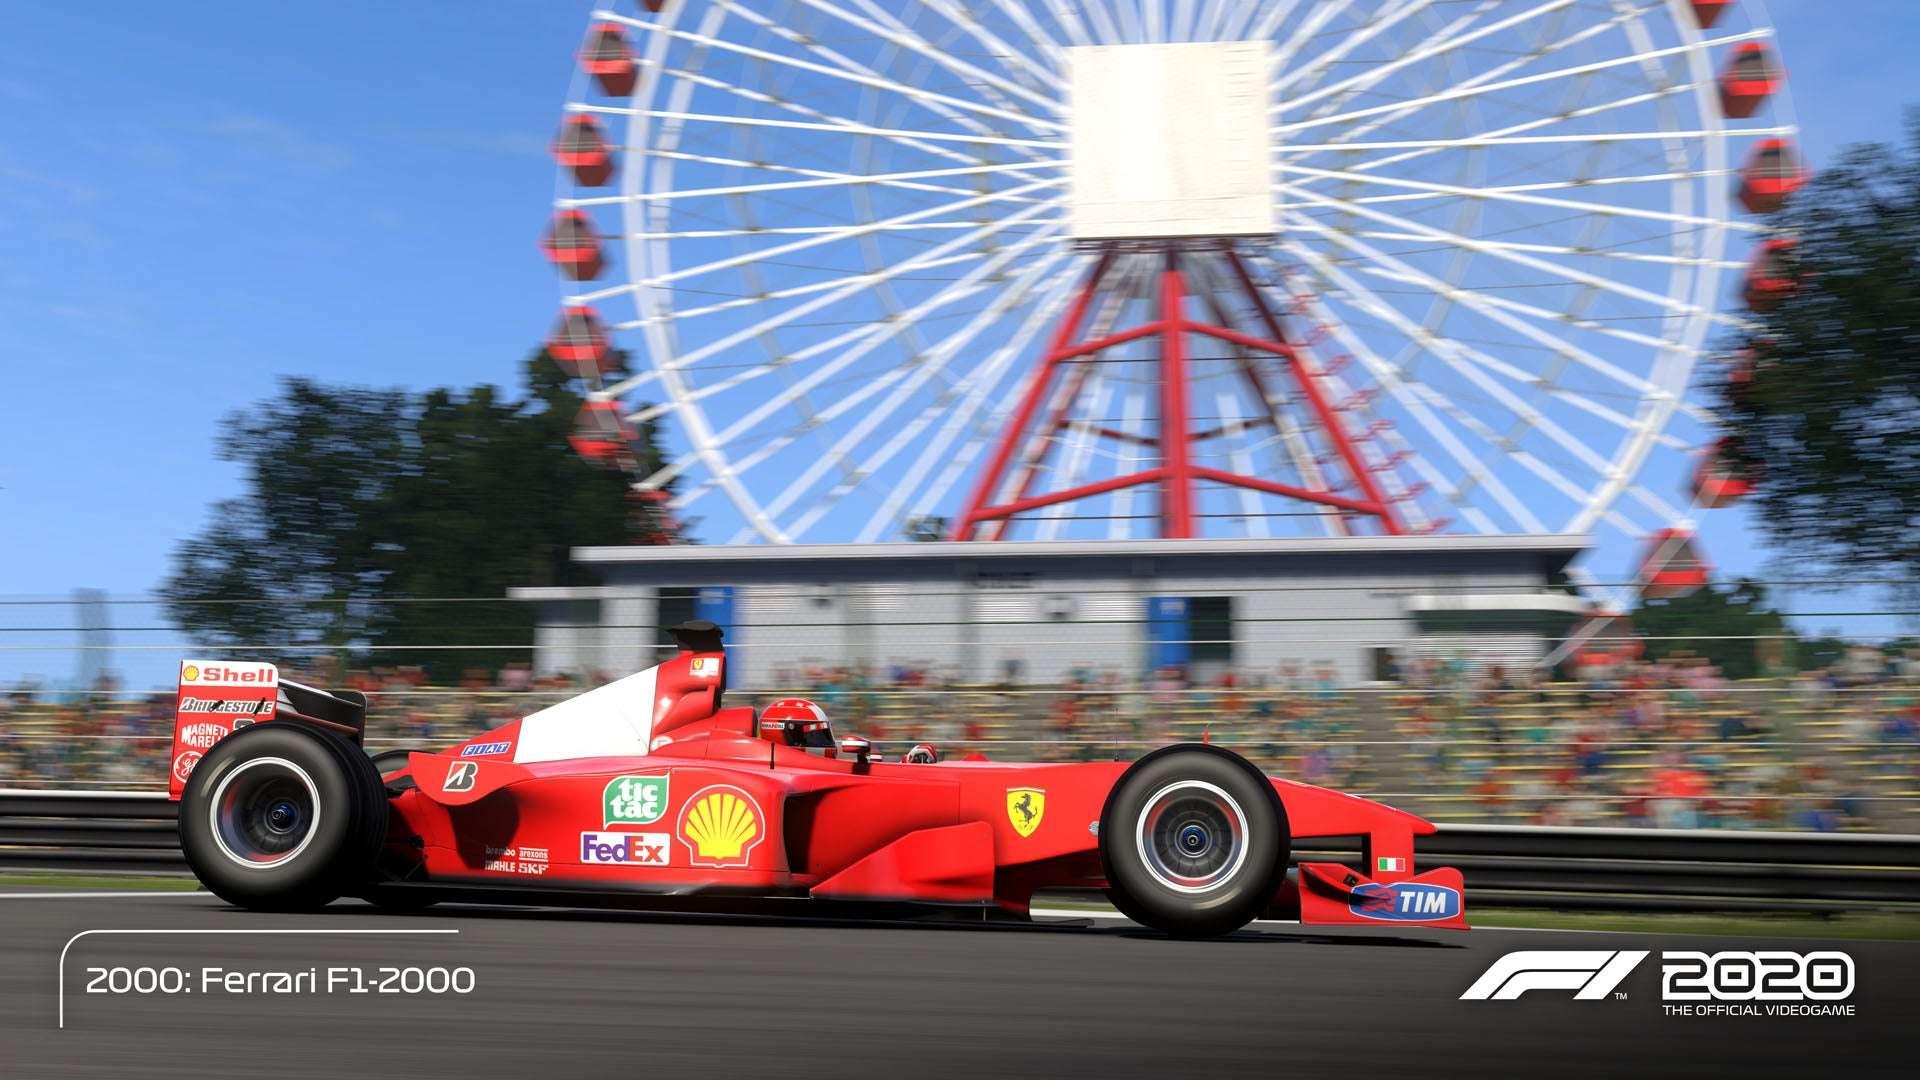 F1 2020 Formula 1 Codemasters Ferrari